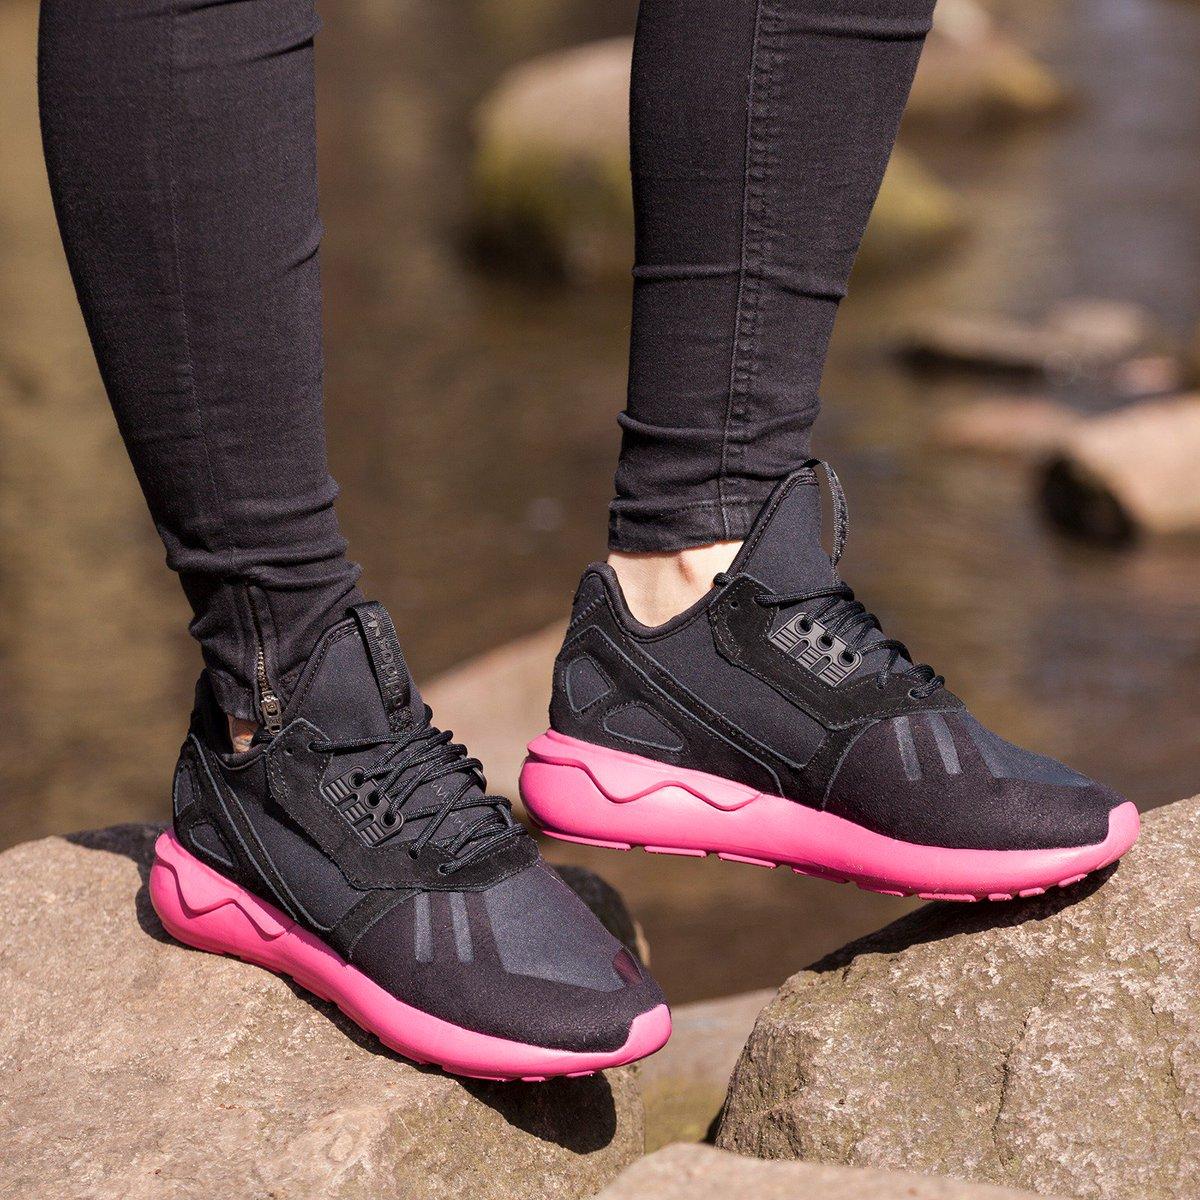 adidas tubular runner damskie czerwone